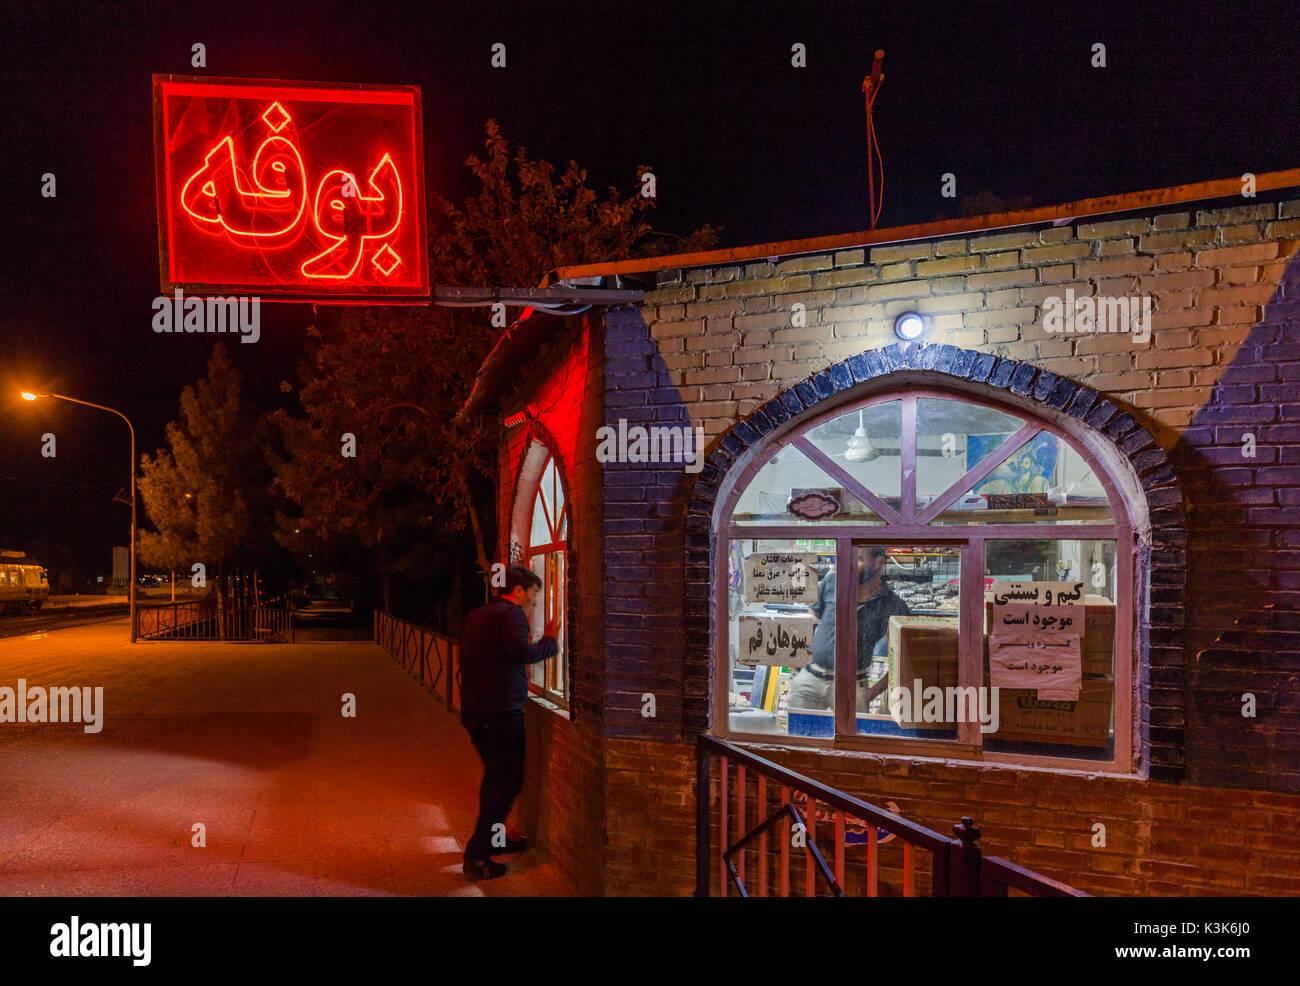 Iran, Central Iran, Kashan, trackside kiosk at Kashan train station Stock Photo